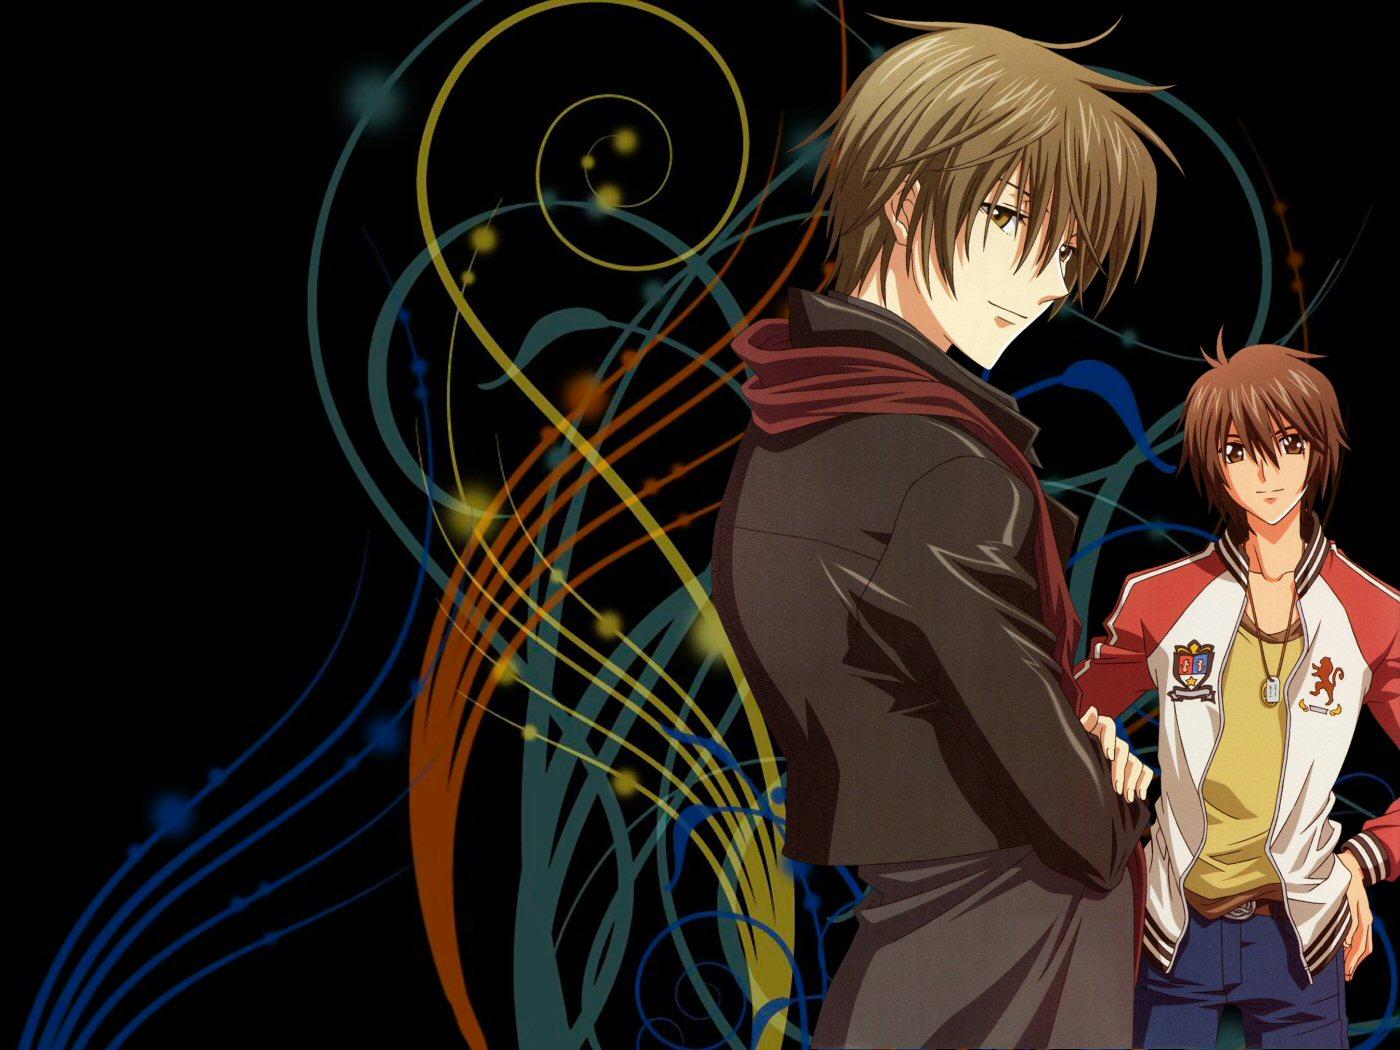 Anime boy wallpaper hd wallpapersafari - Wallpapers hd anime ...